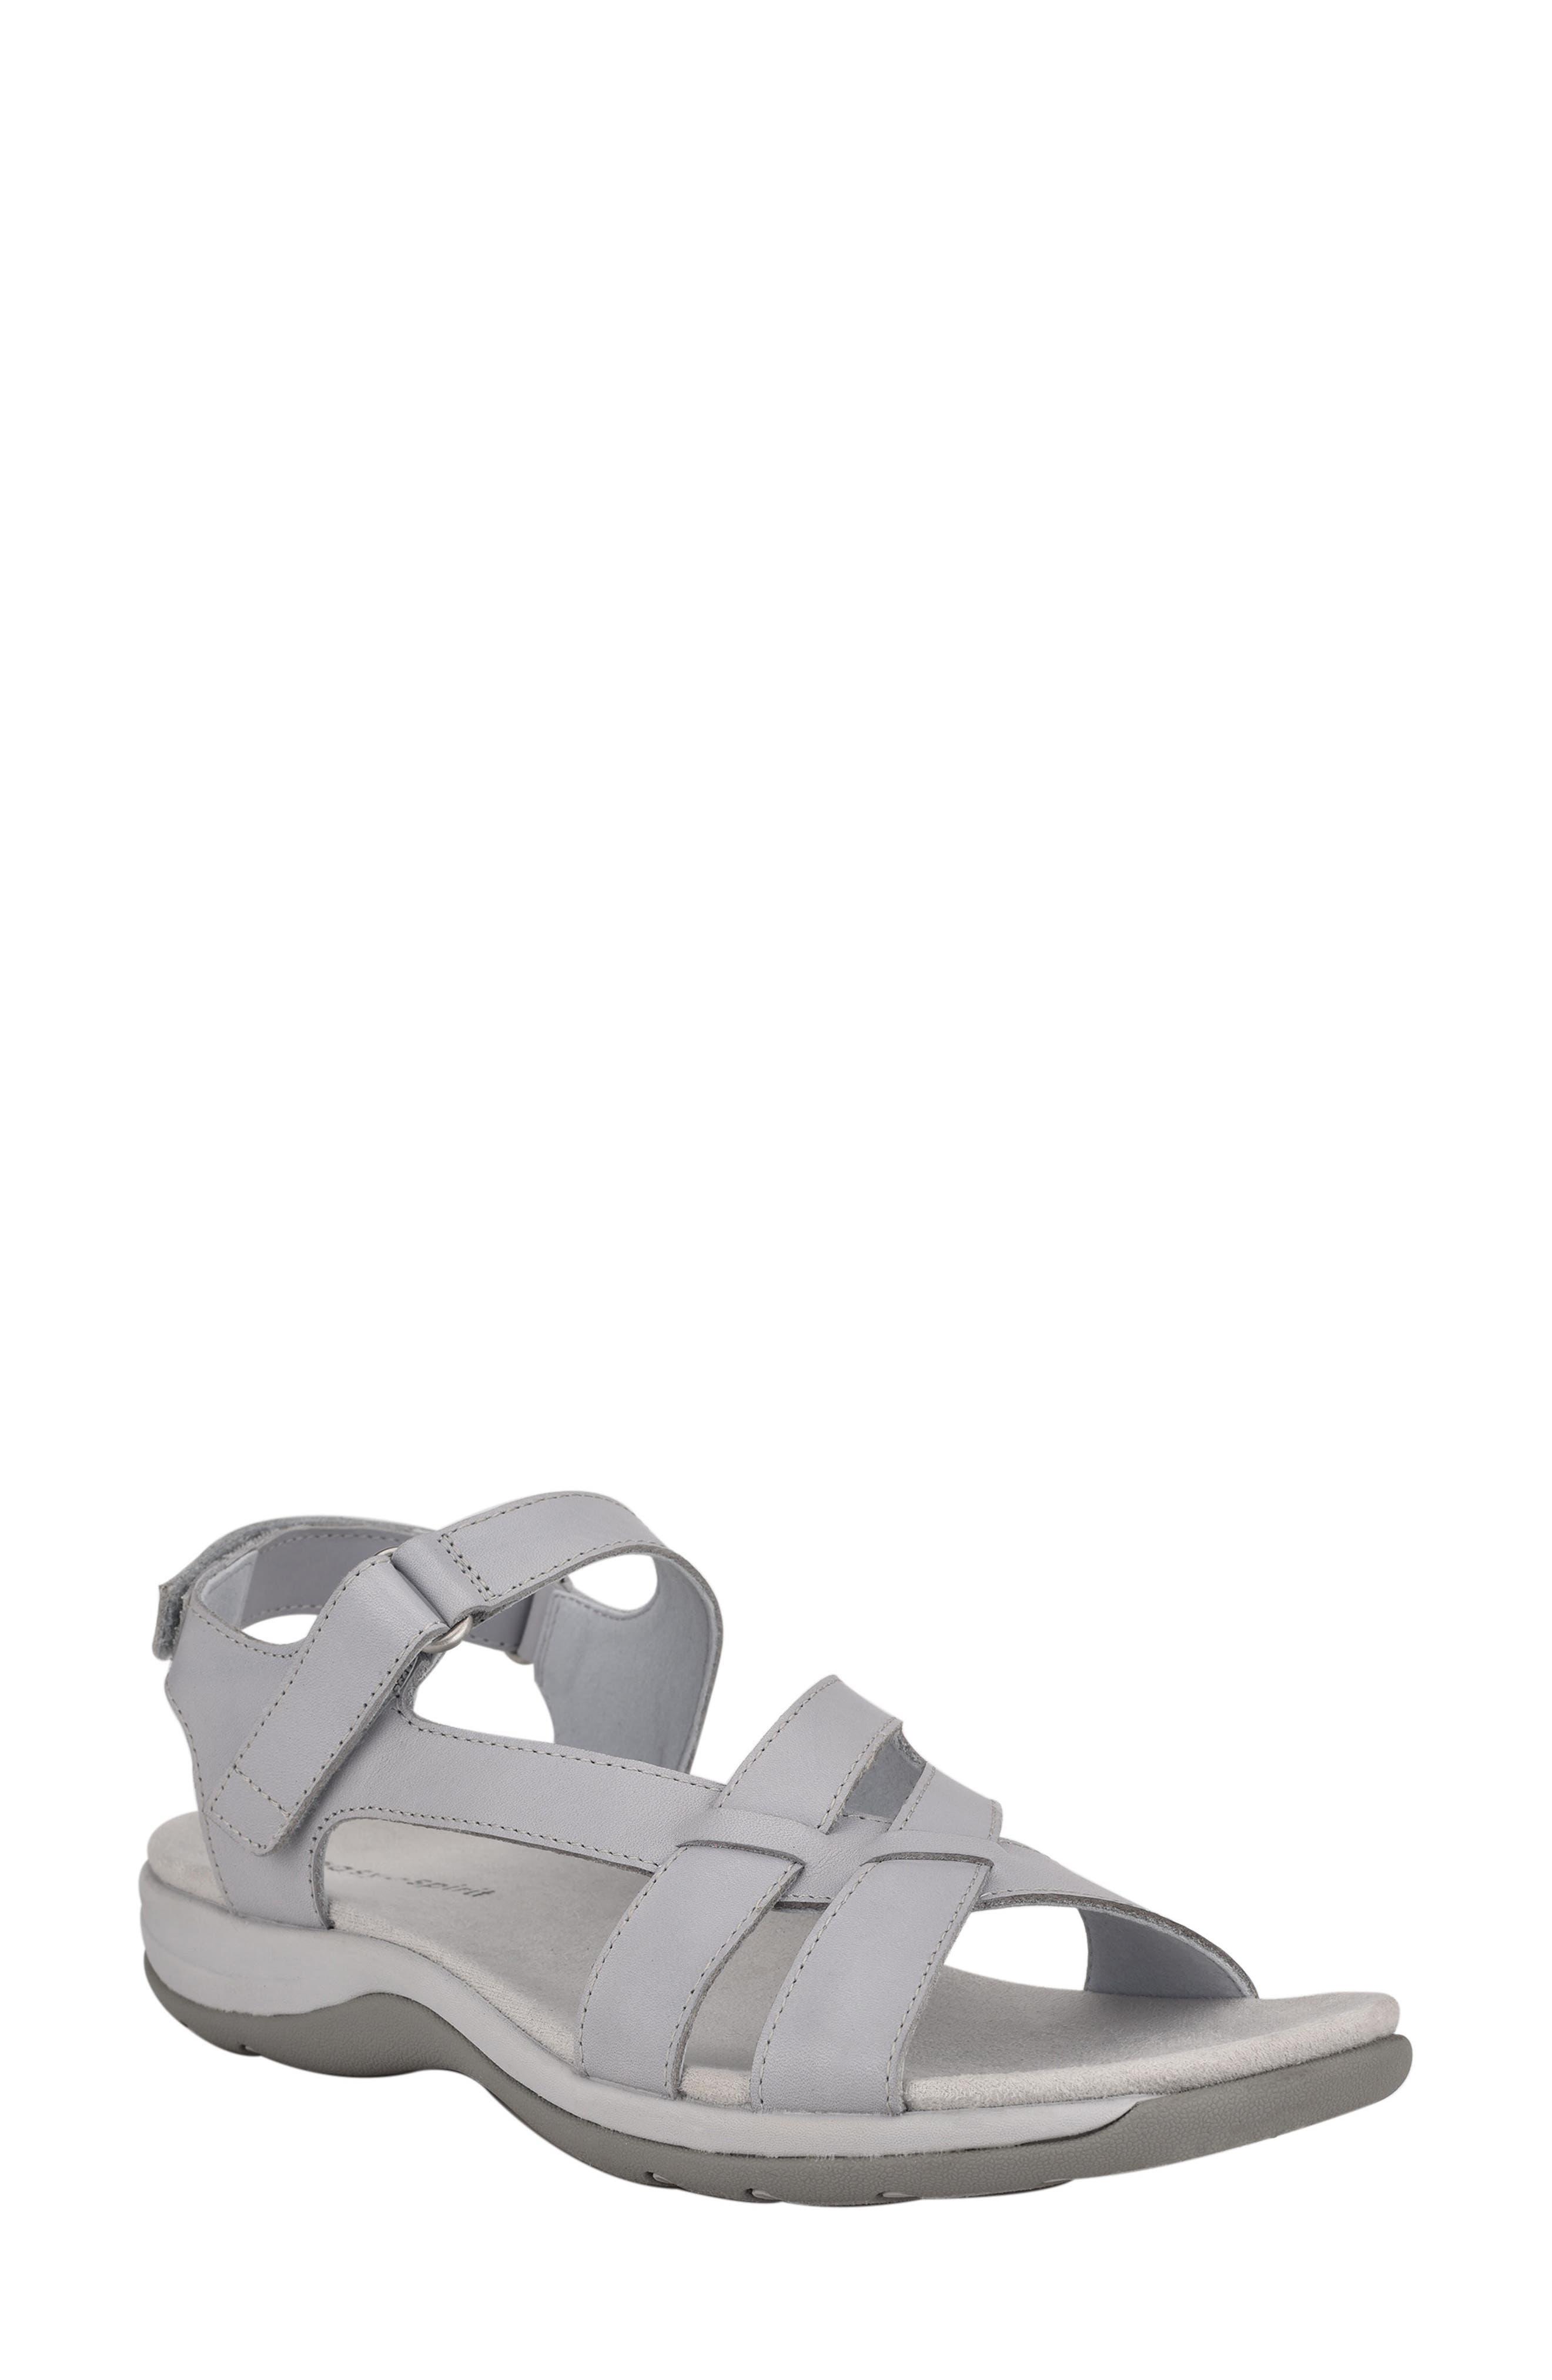 Silvie Strappy Sandal